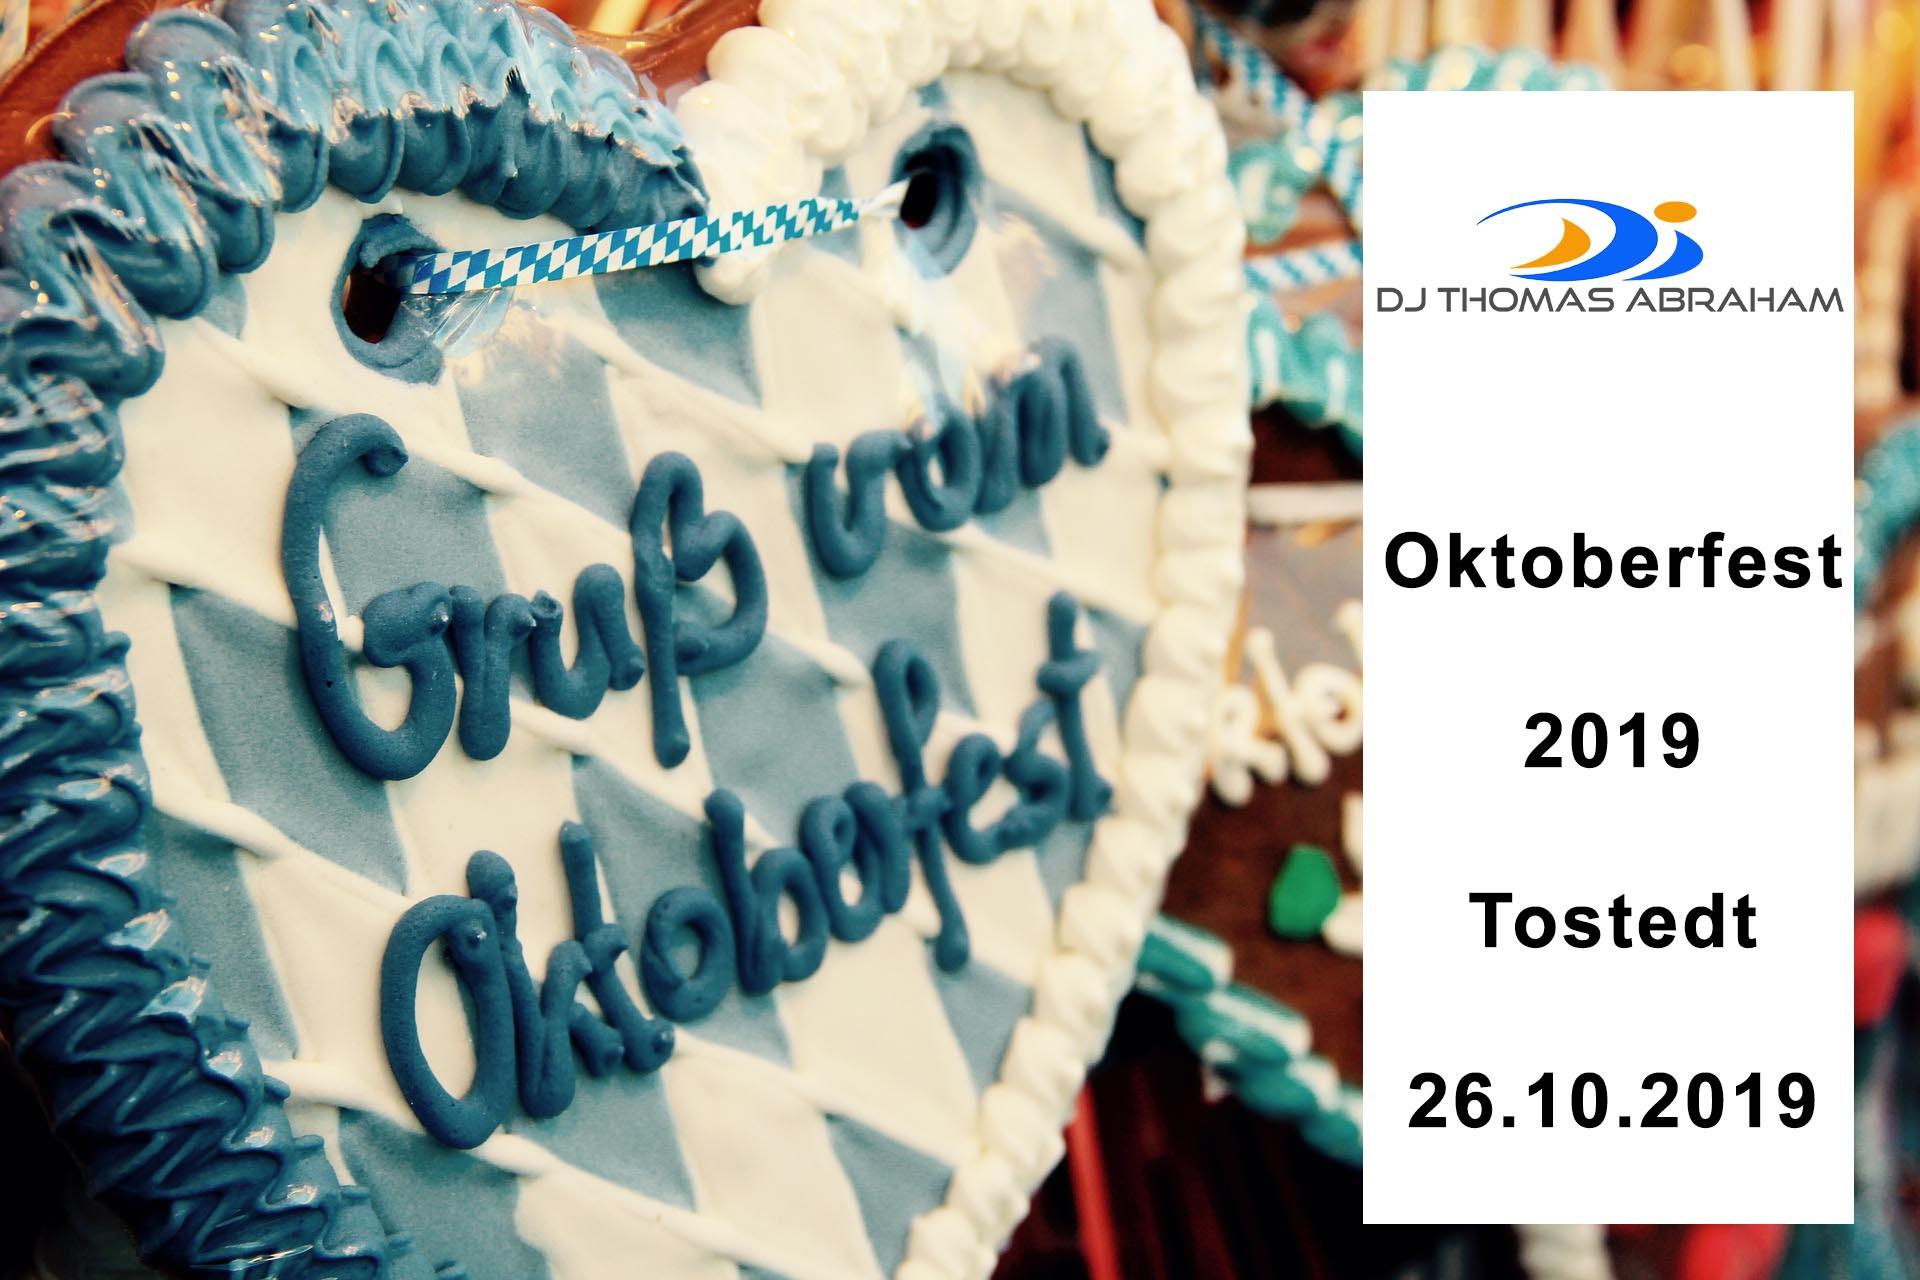 Oktoberfest Tostedt 2019